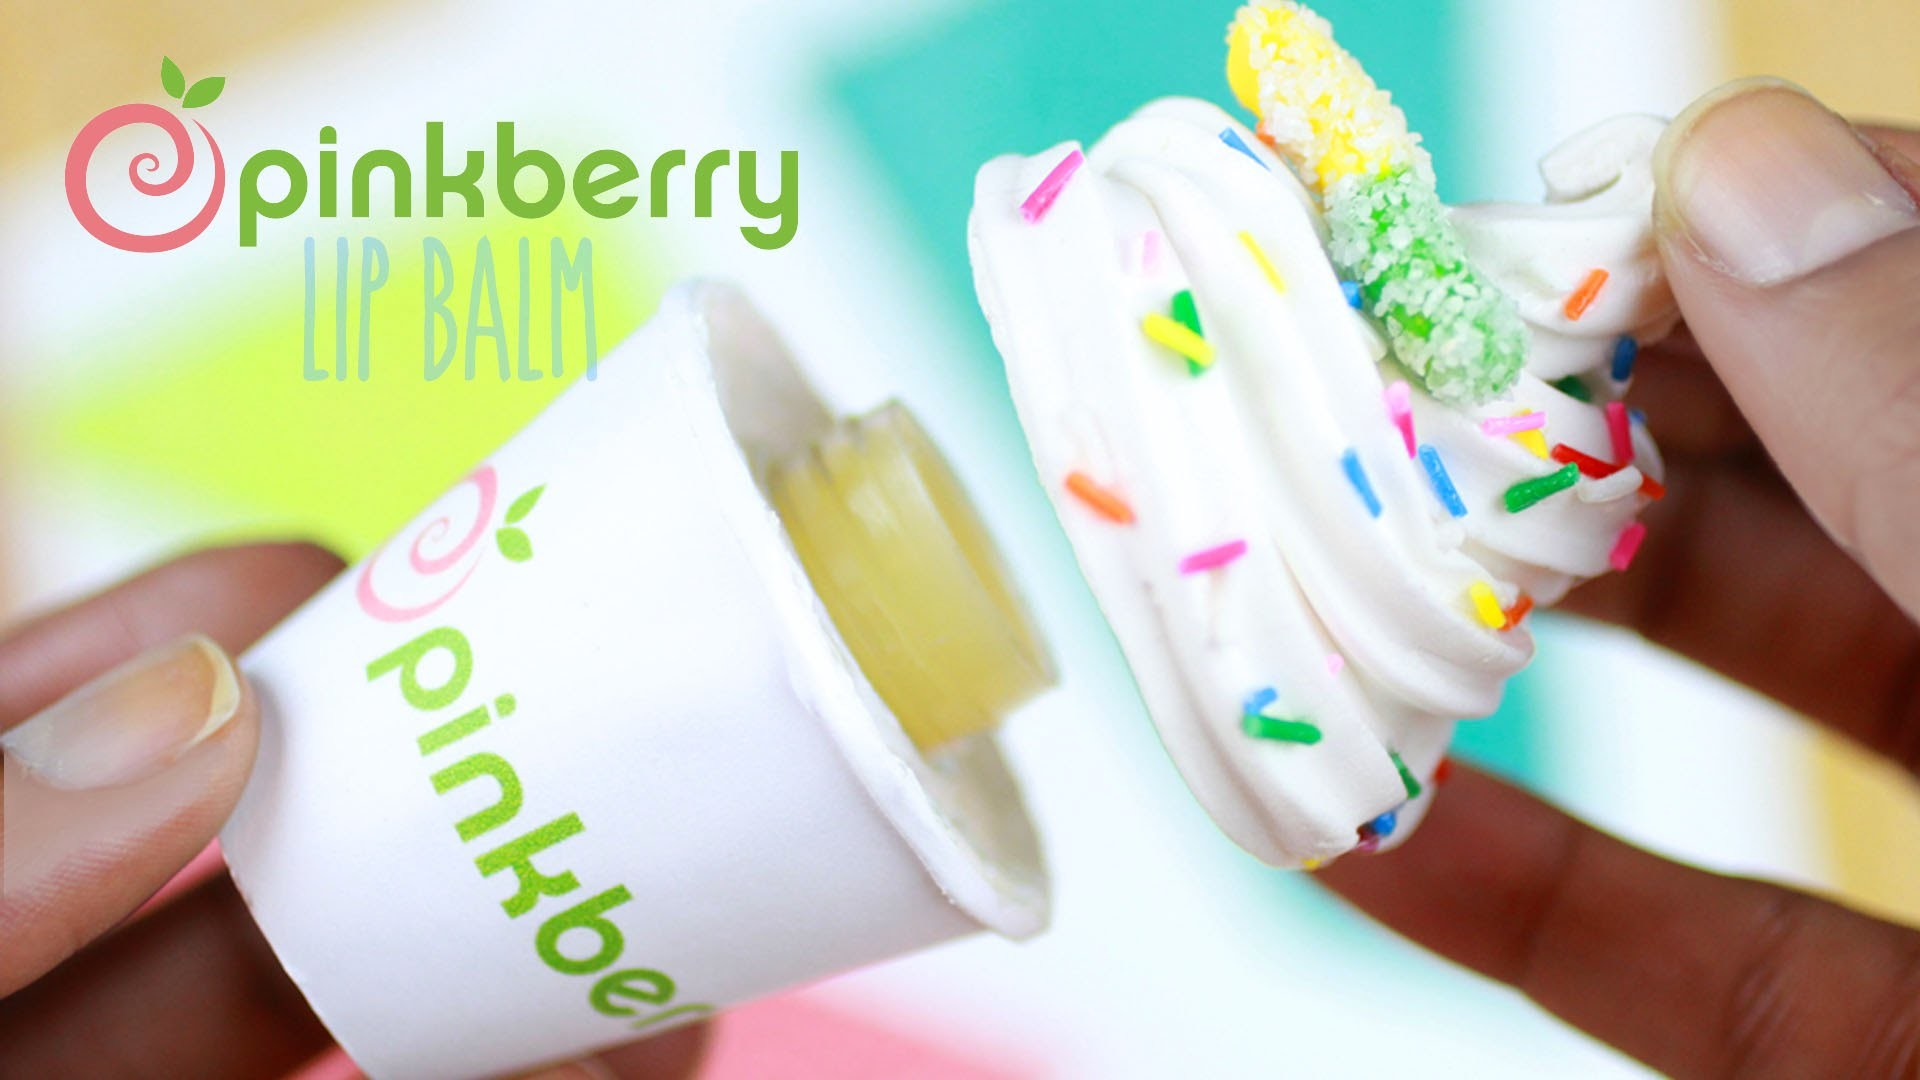 DIY Pinkberry Lip Gloss Jar - How To Make Beeswax Lip Balm Tutorial - Frozen Yogurt Polymer Clay